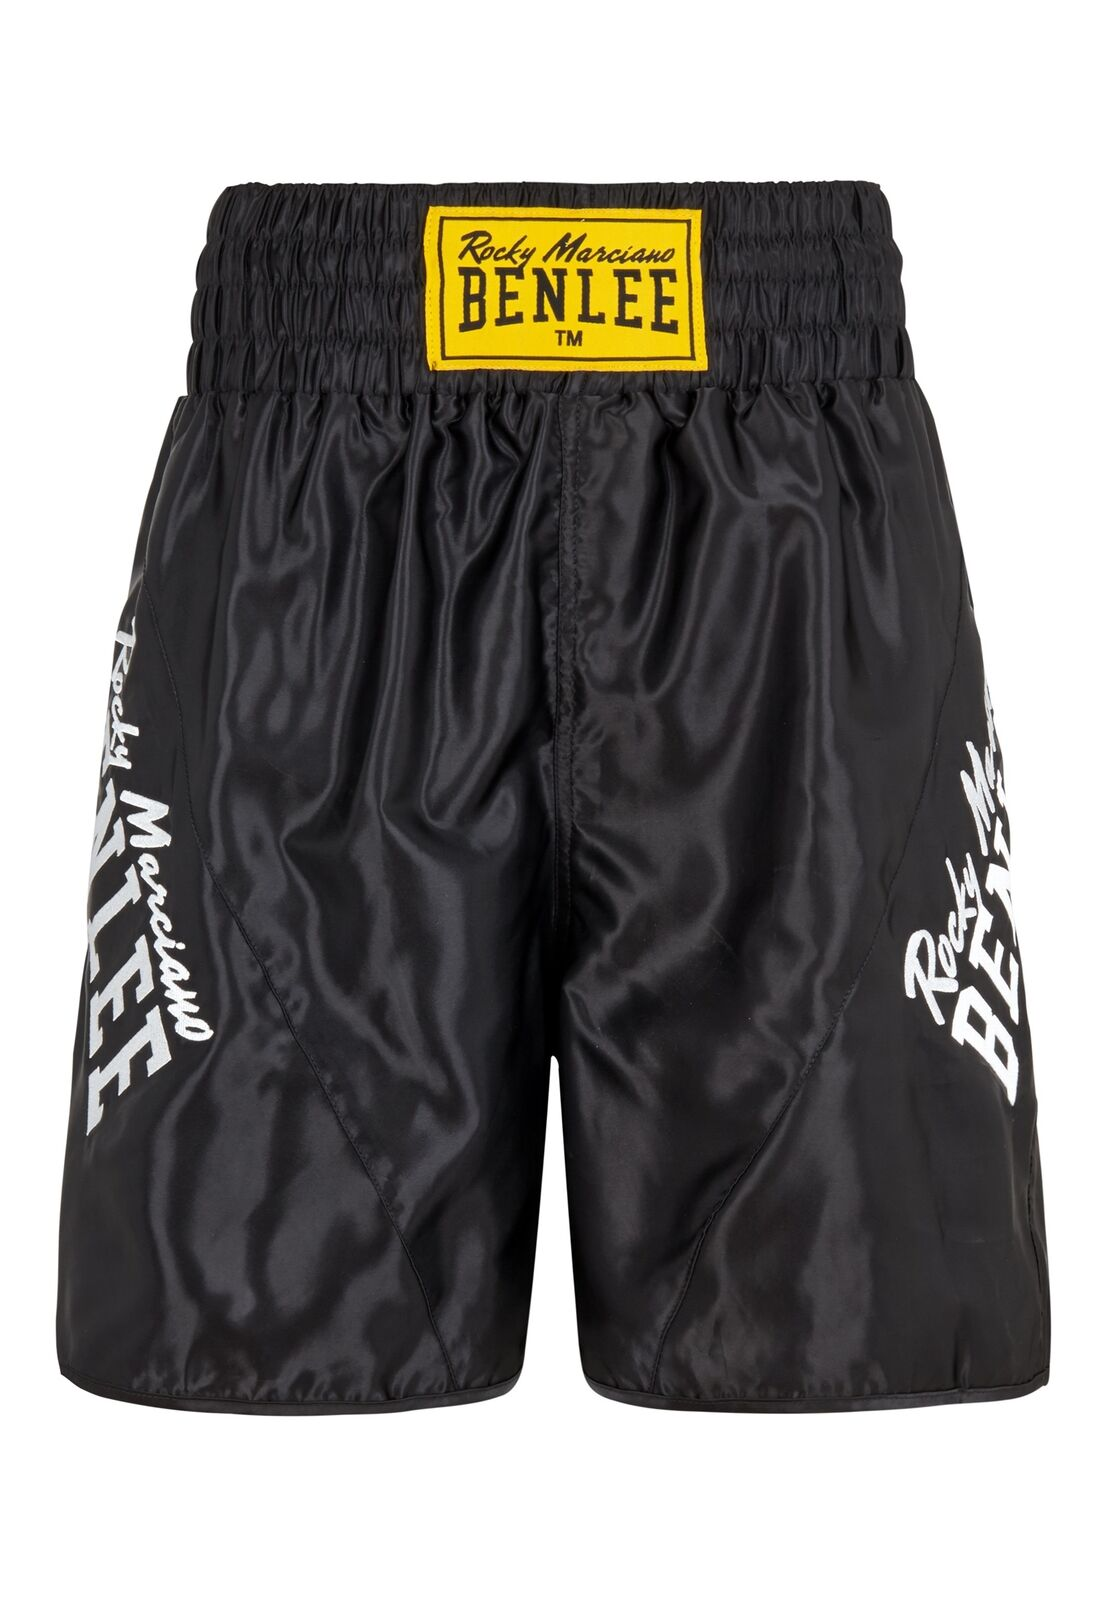 Benlee Men/'s Boxshorts Goldy Shorts Thai Rocky Mma Kickboxing Muay Thai Boxes